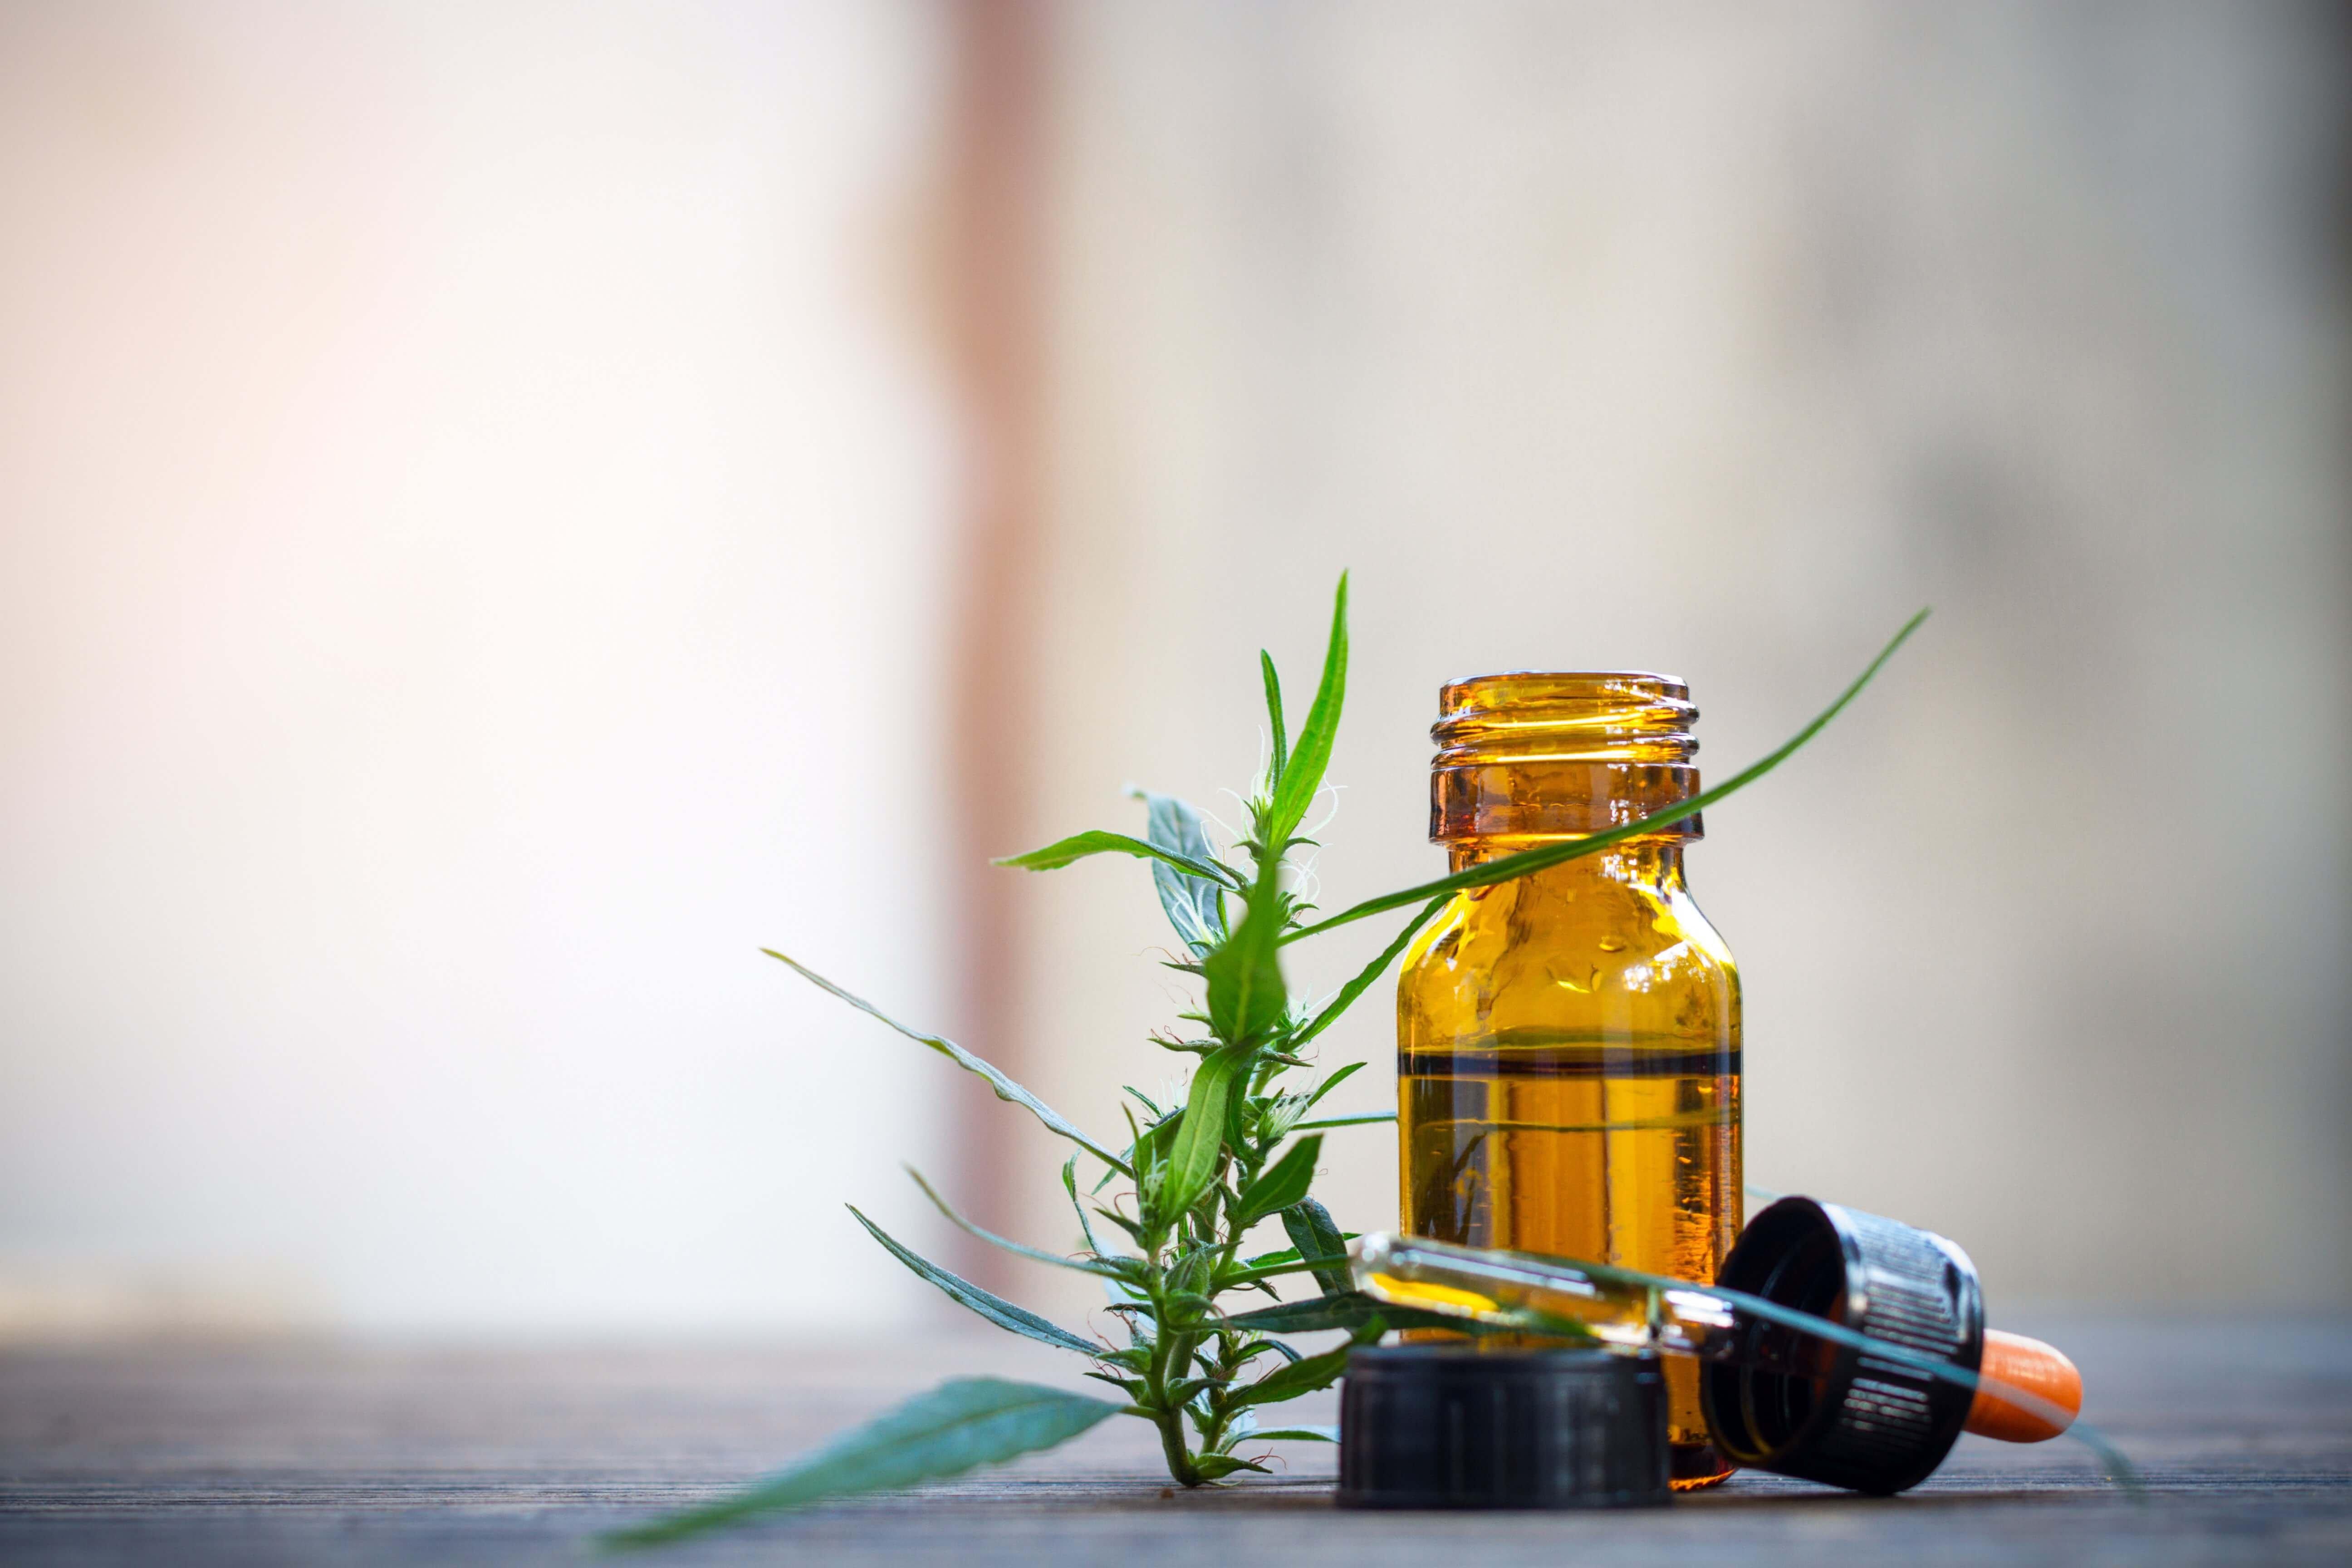 medical marijuana in oil